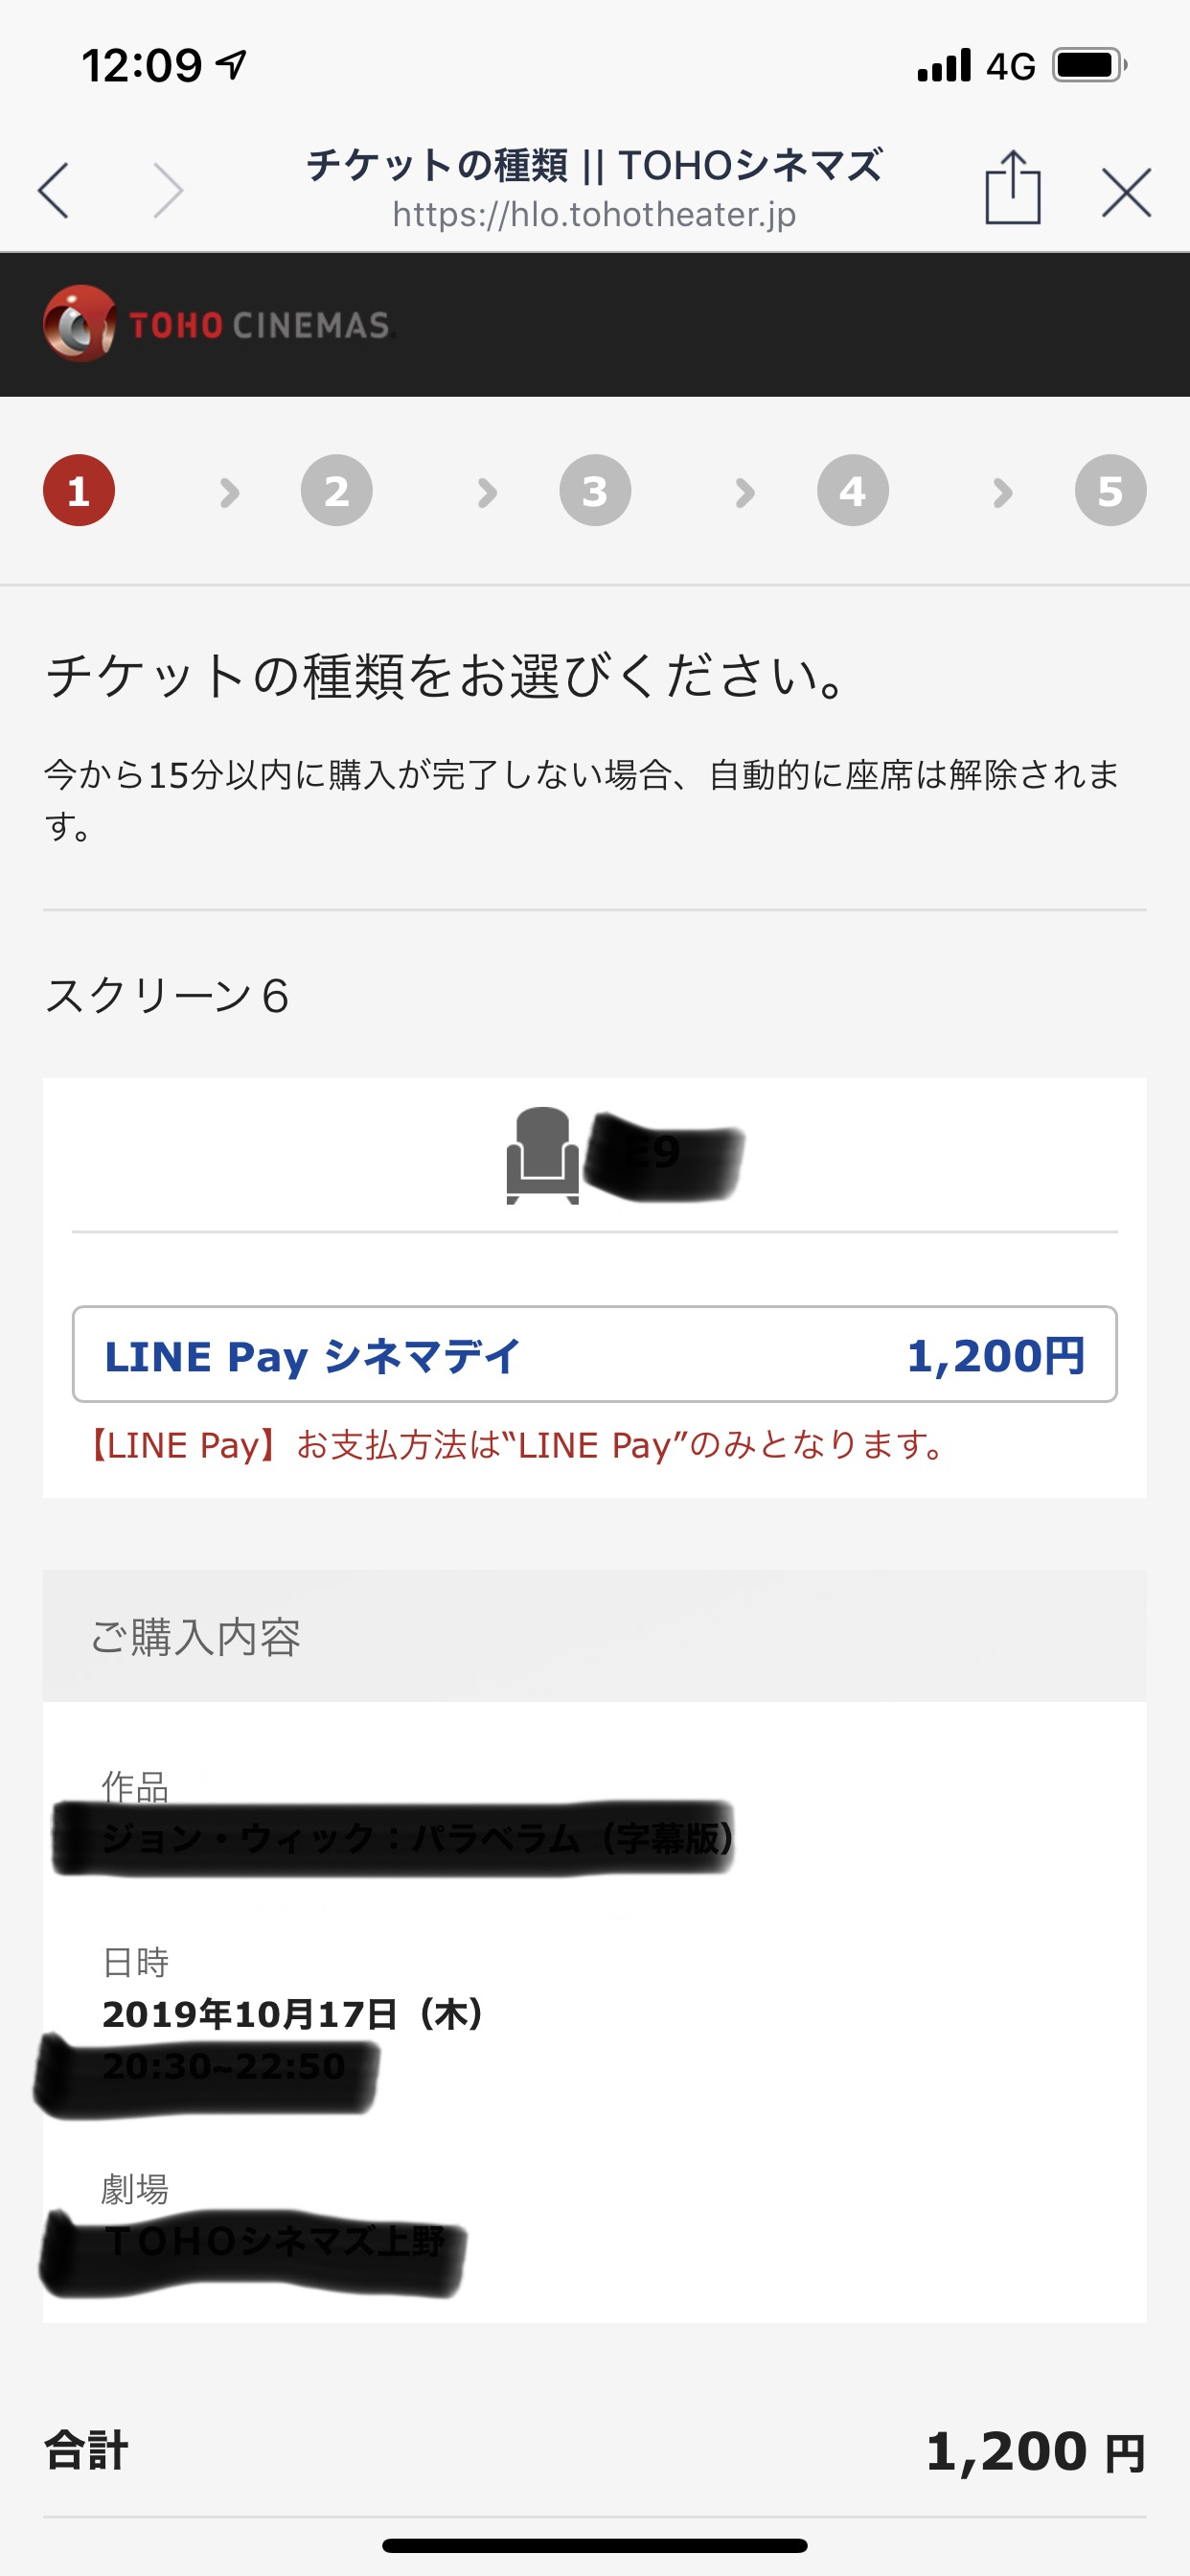 LINEPay選択2